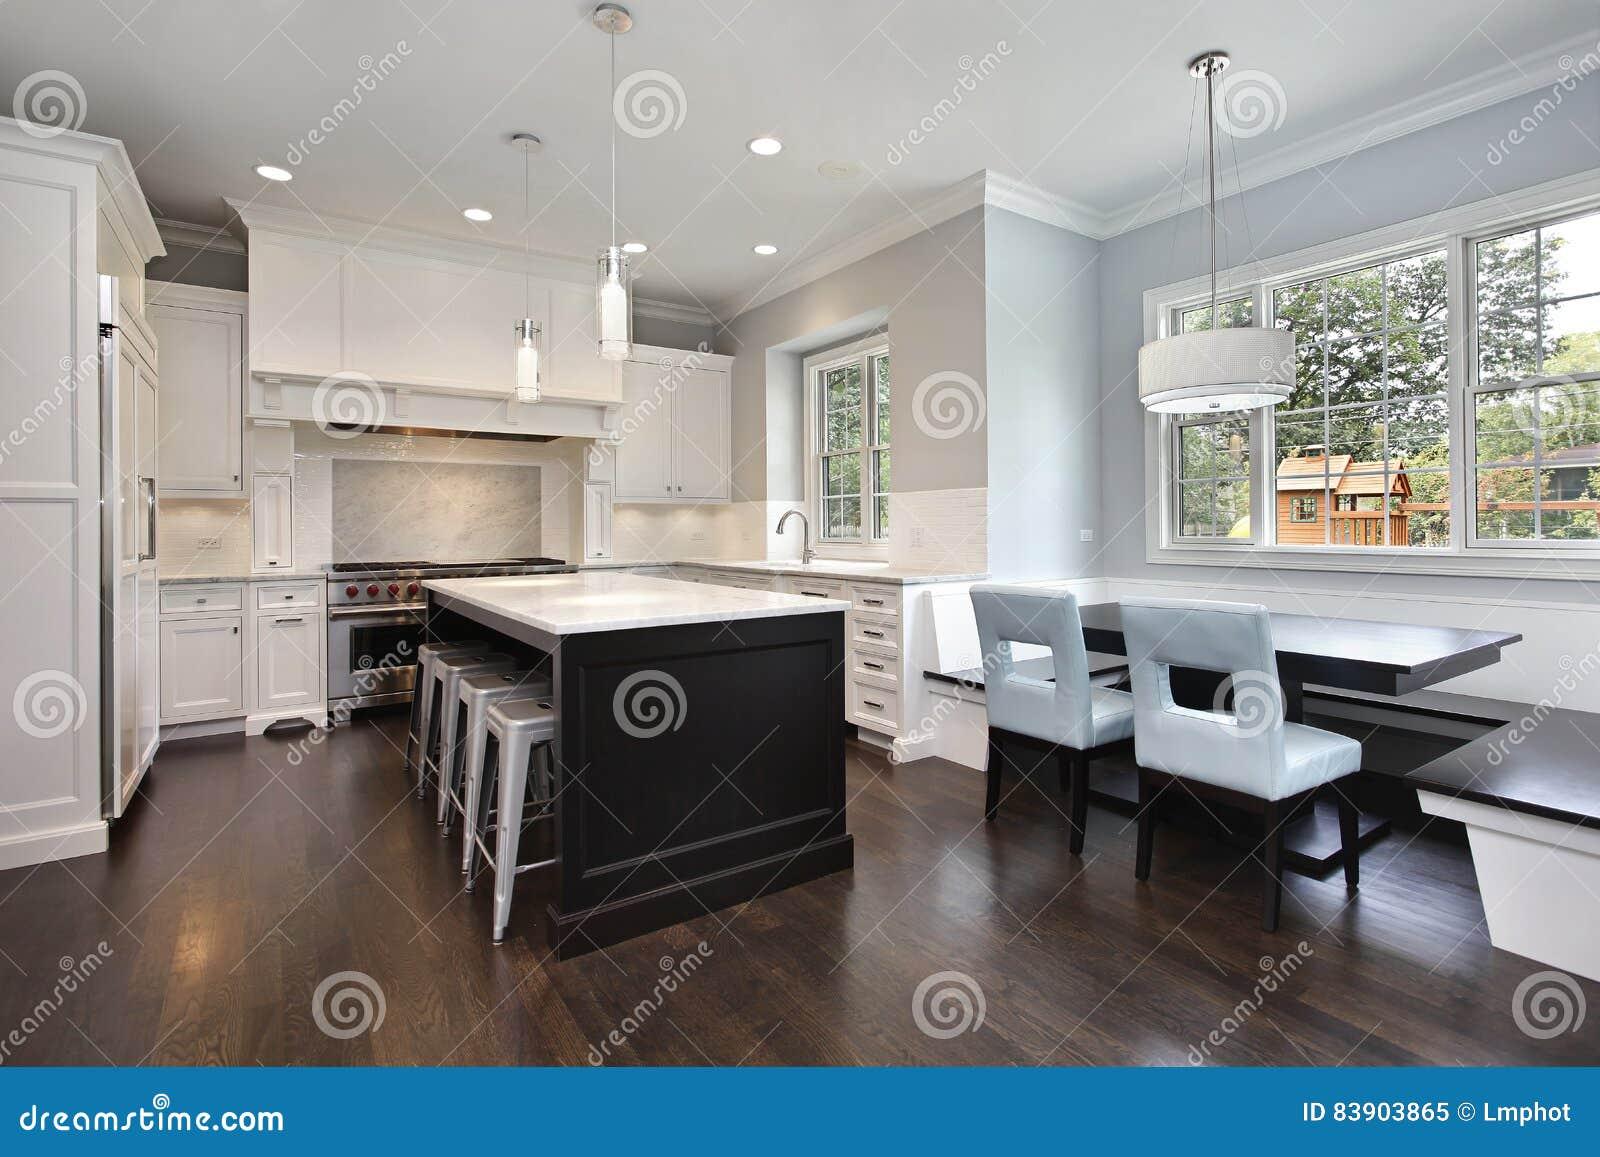 bank fur kuche kuche mit bankkaltsitzbank fur kuche ideen fur kuchen bank f r k che luxus. Black Bedroom Furniture Sets. Home Design Ideas